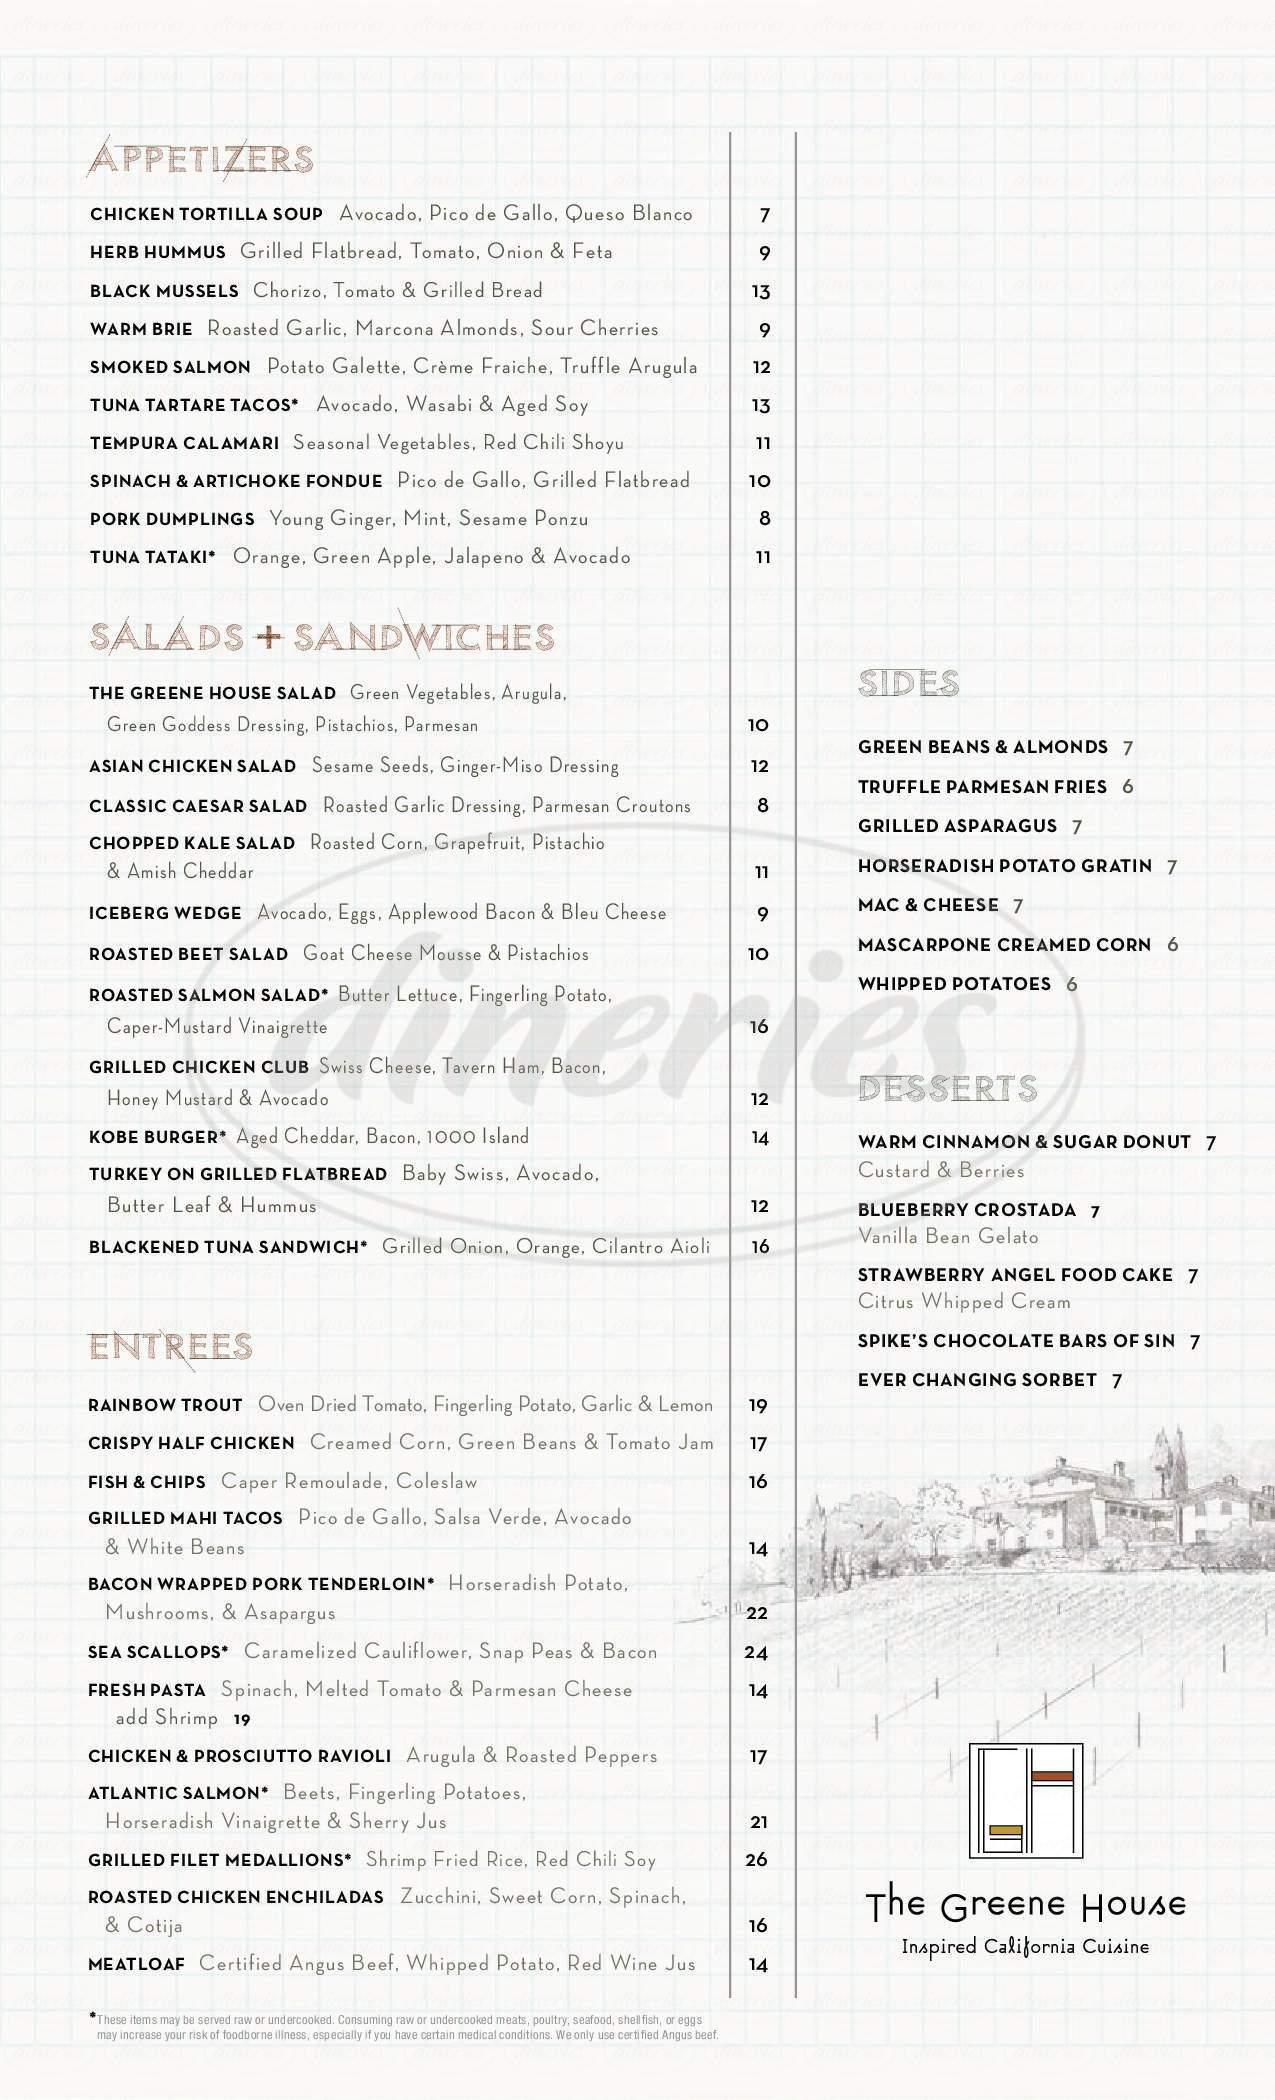 menu for The Greene House